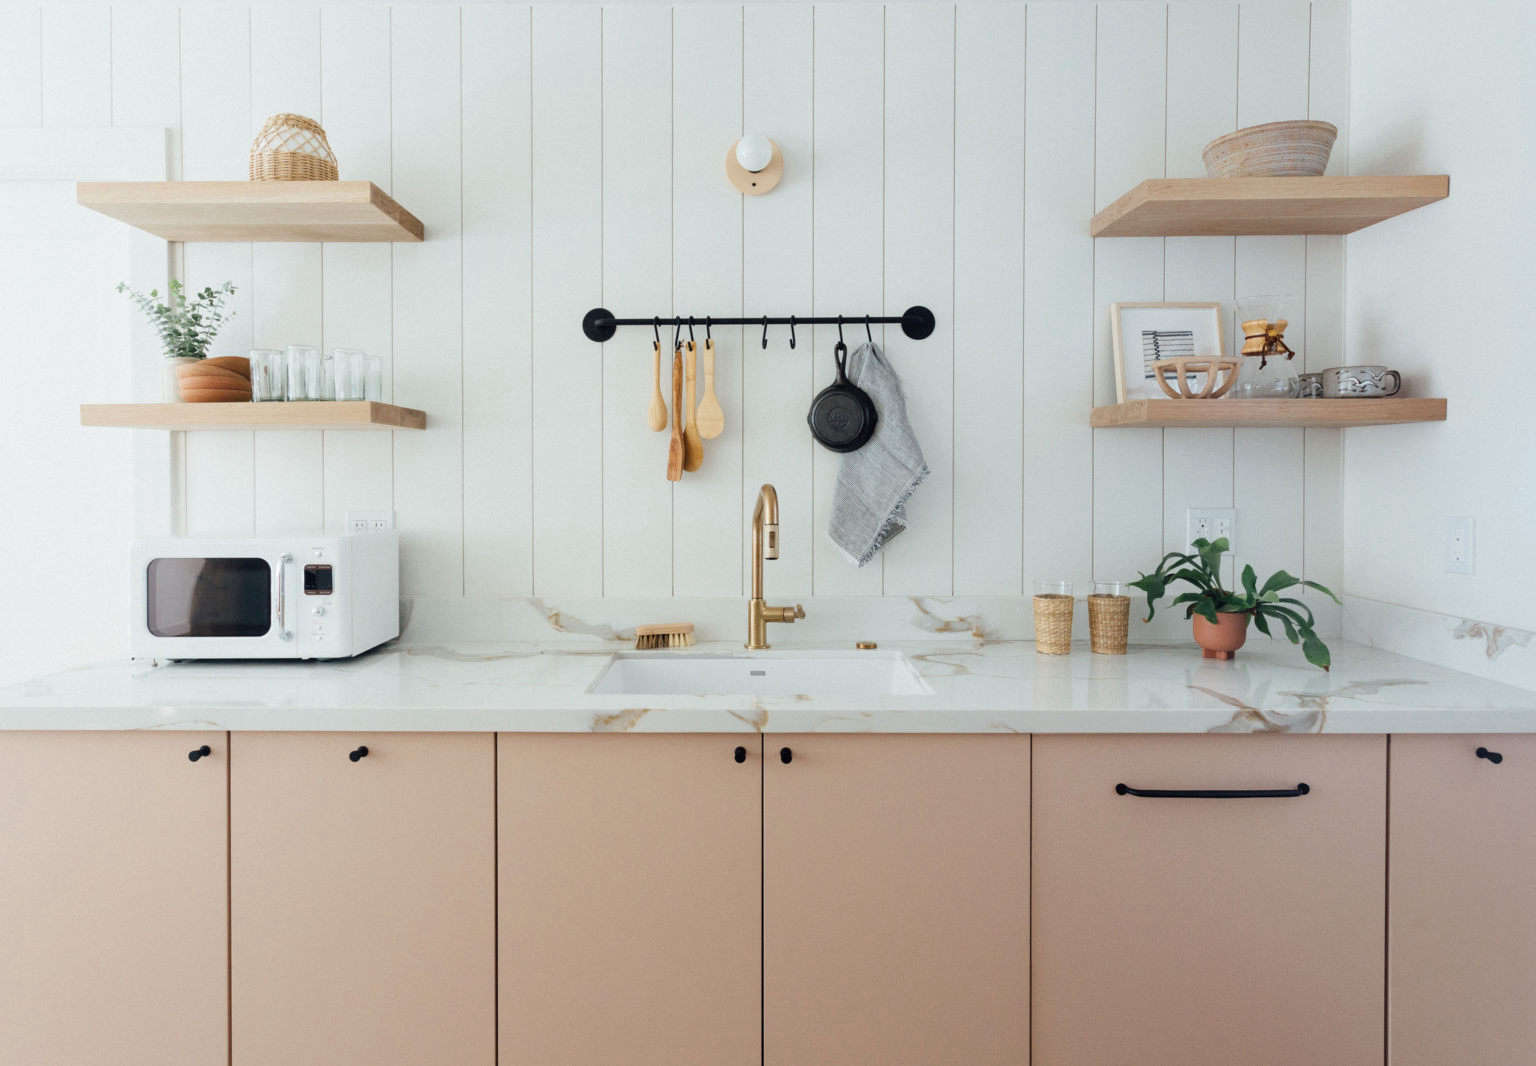 ikea semihandmade kitchen solana beach ca studio surface jennie corti photo 1 1536x1066